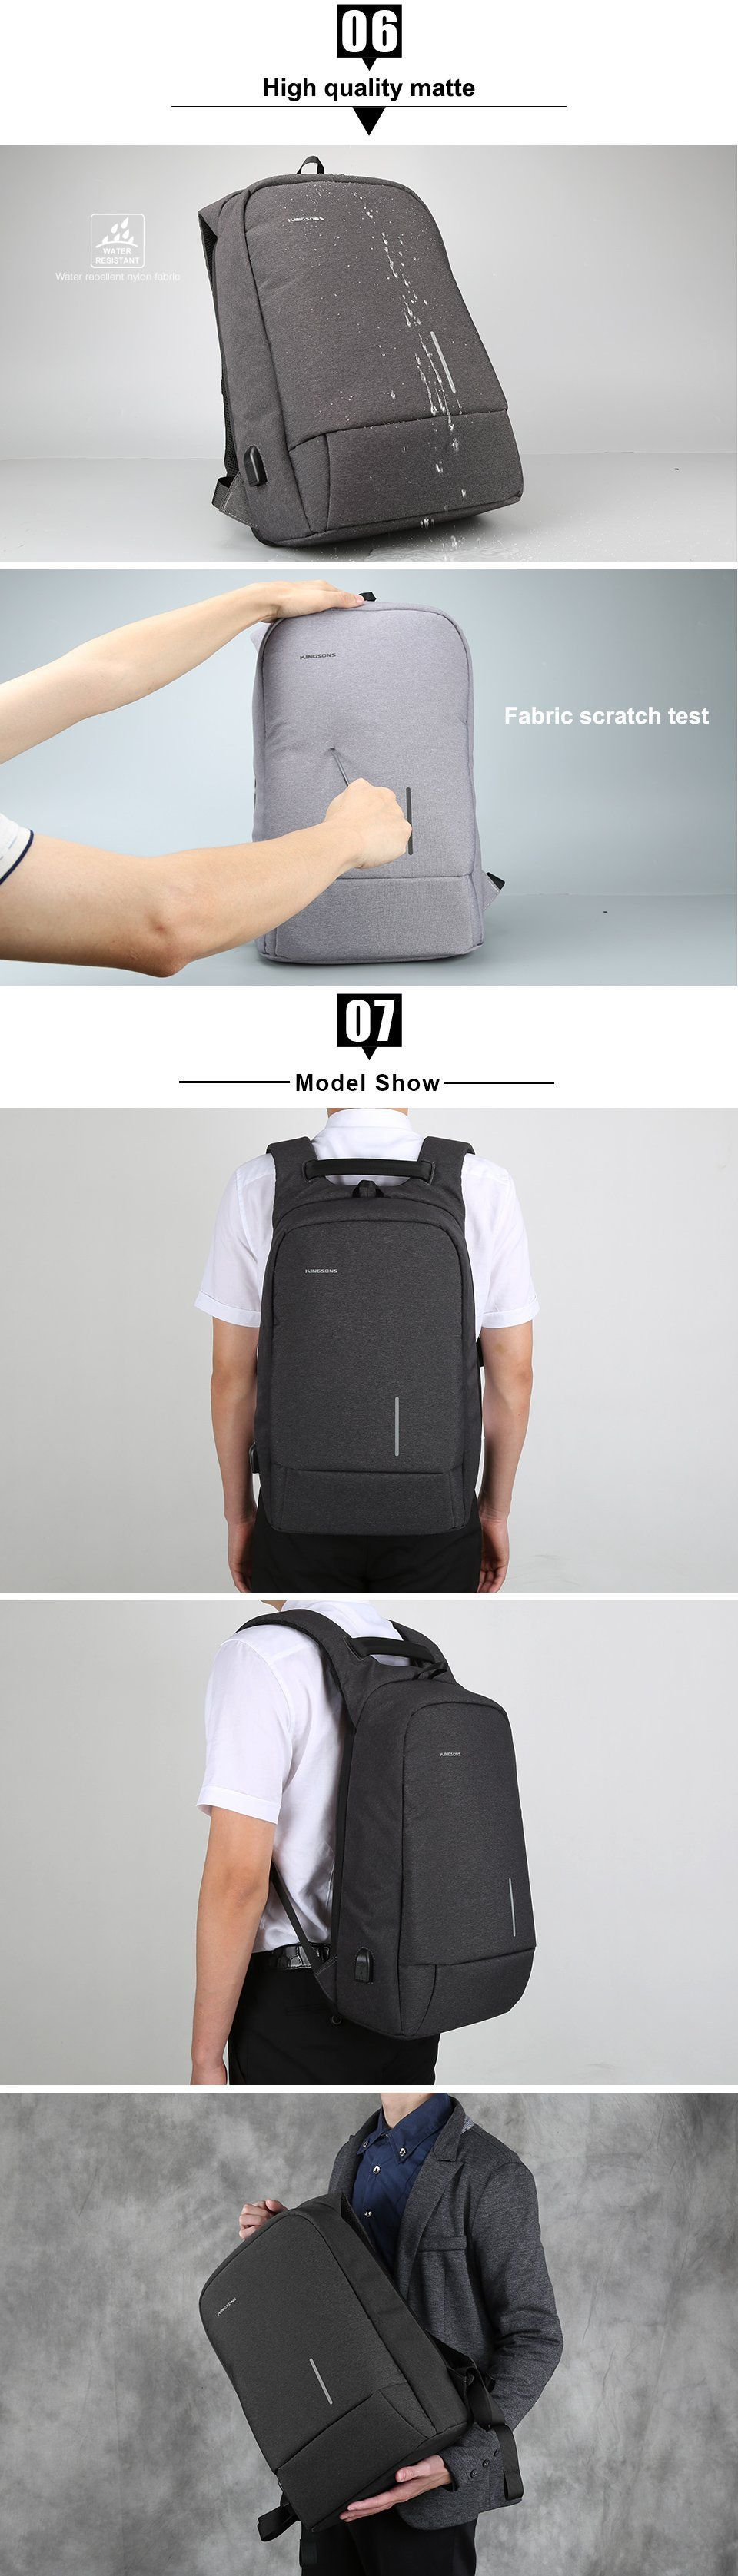 Description Laptop Backpack with external USB charging